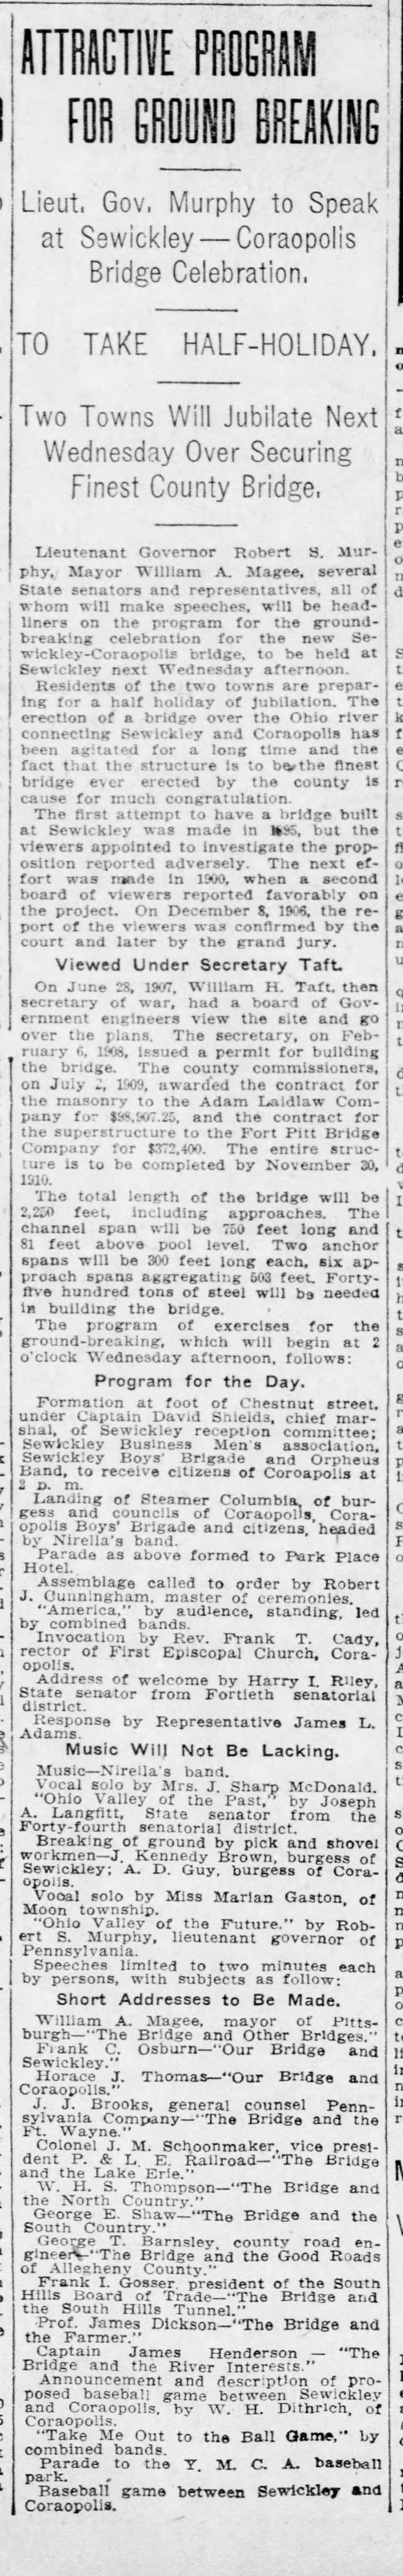 1909-07-18 The Pittsbugh Sunday Post (p6).jpg